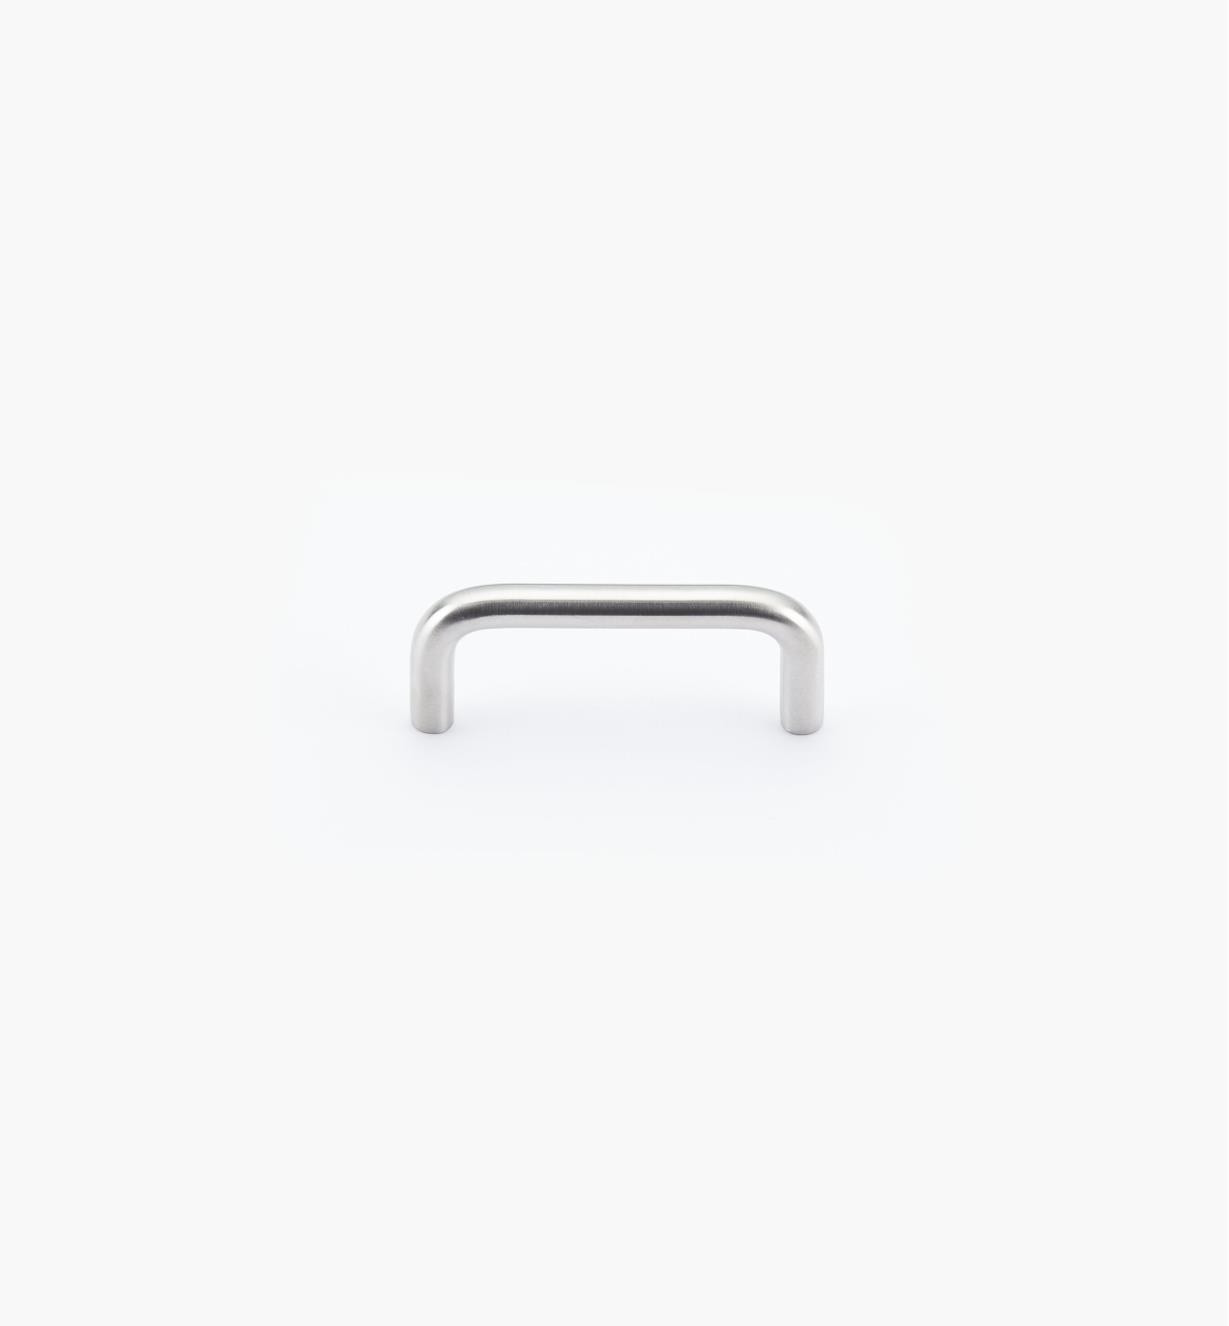 01W6805 - Poignée-fil en acier inoxydable, fini brossé, 64 mm x 8 mm